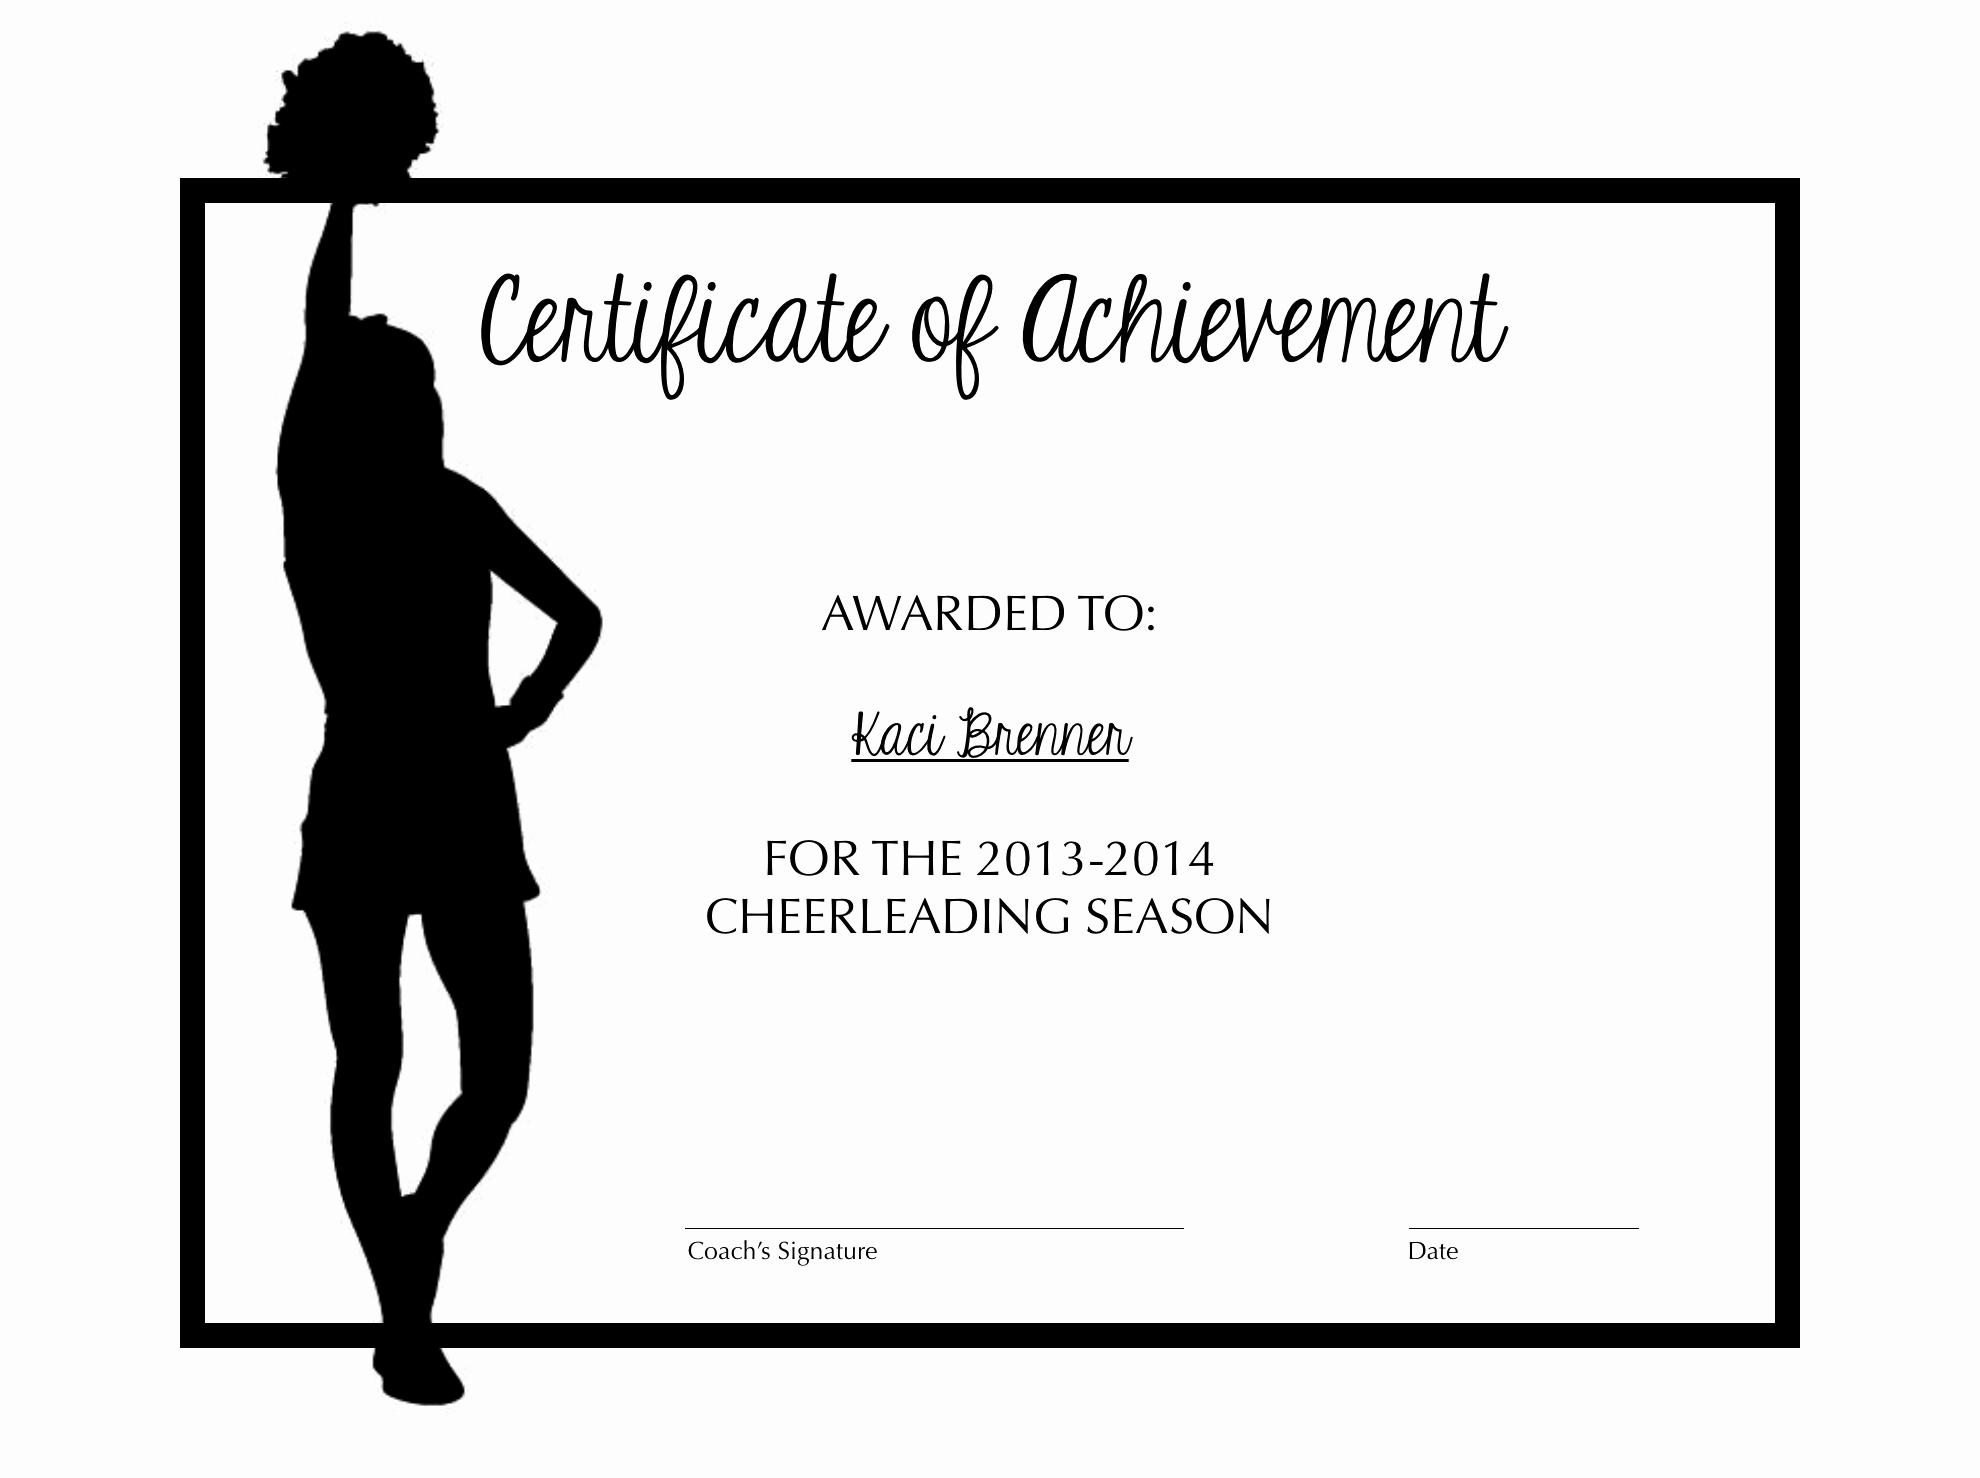 Free Cheer Award Certificate Templates Beautiful Cheerleading Certificate Of Achievement Cheer